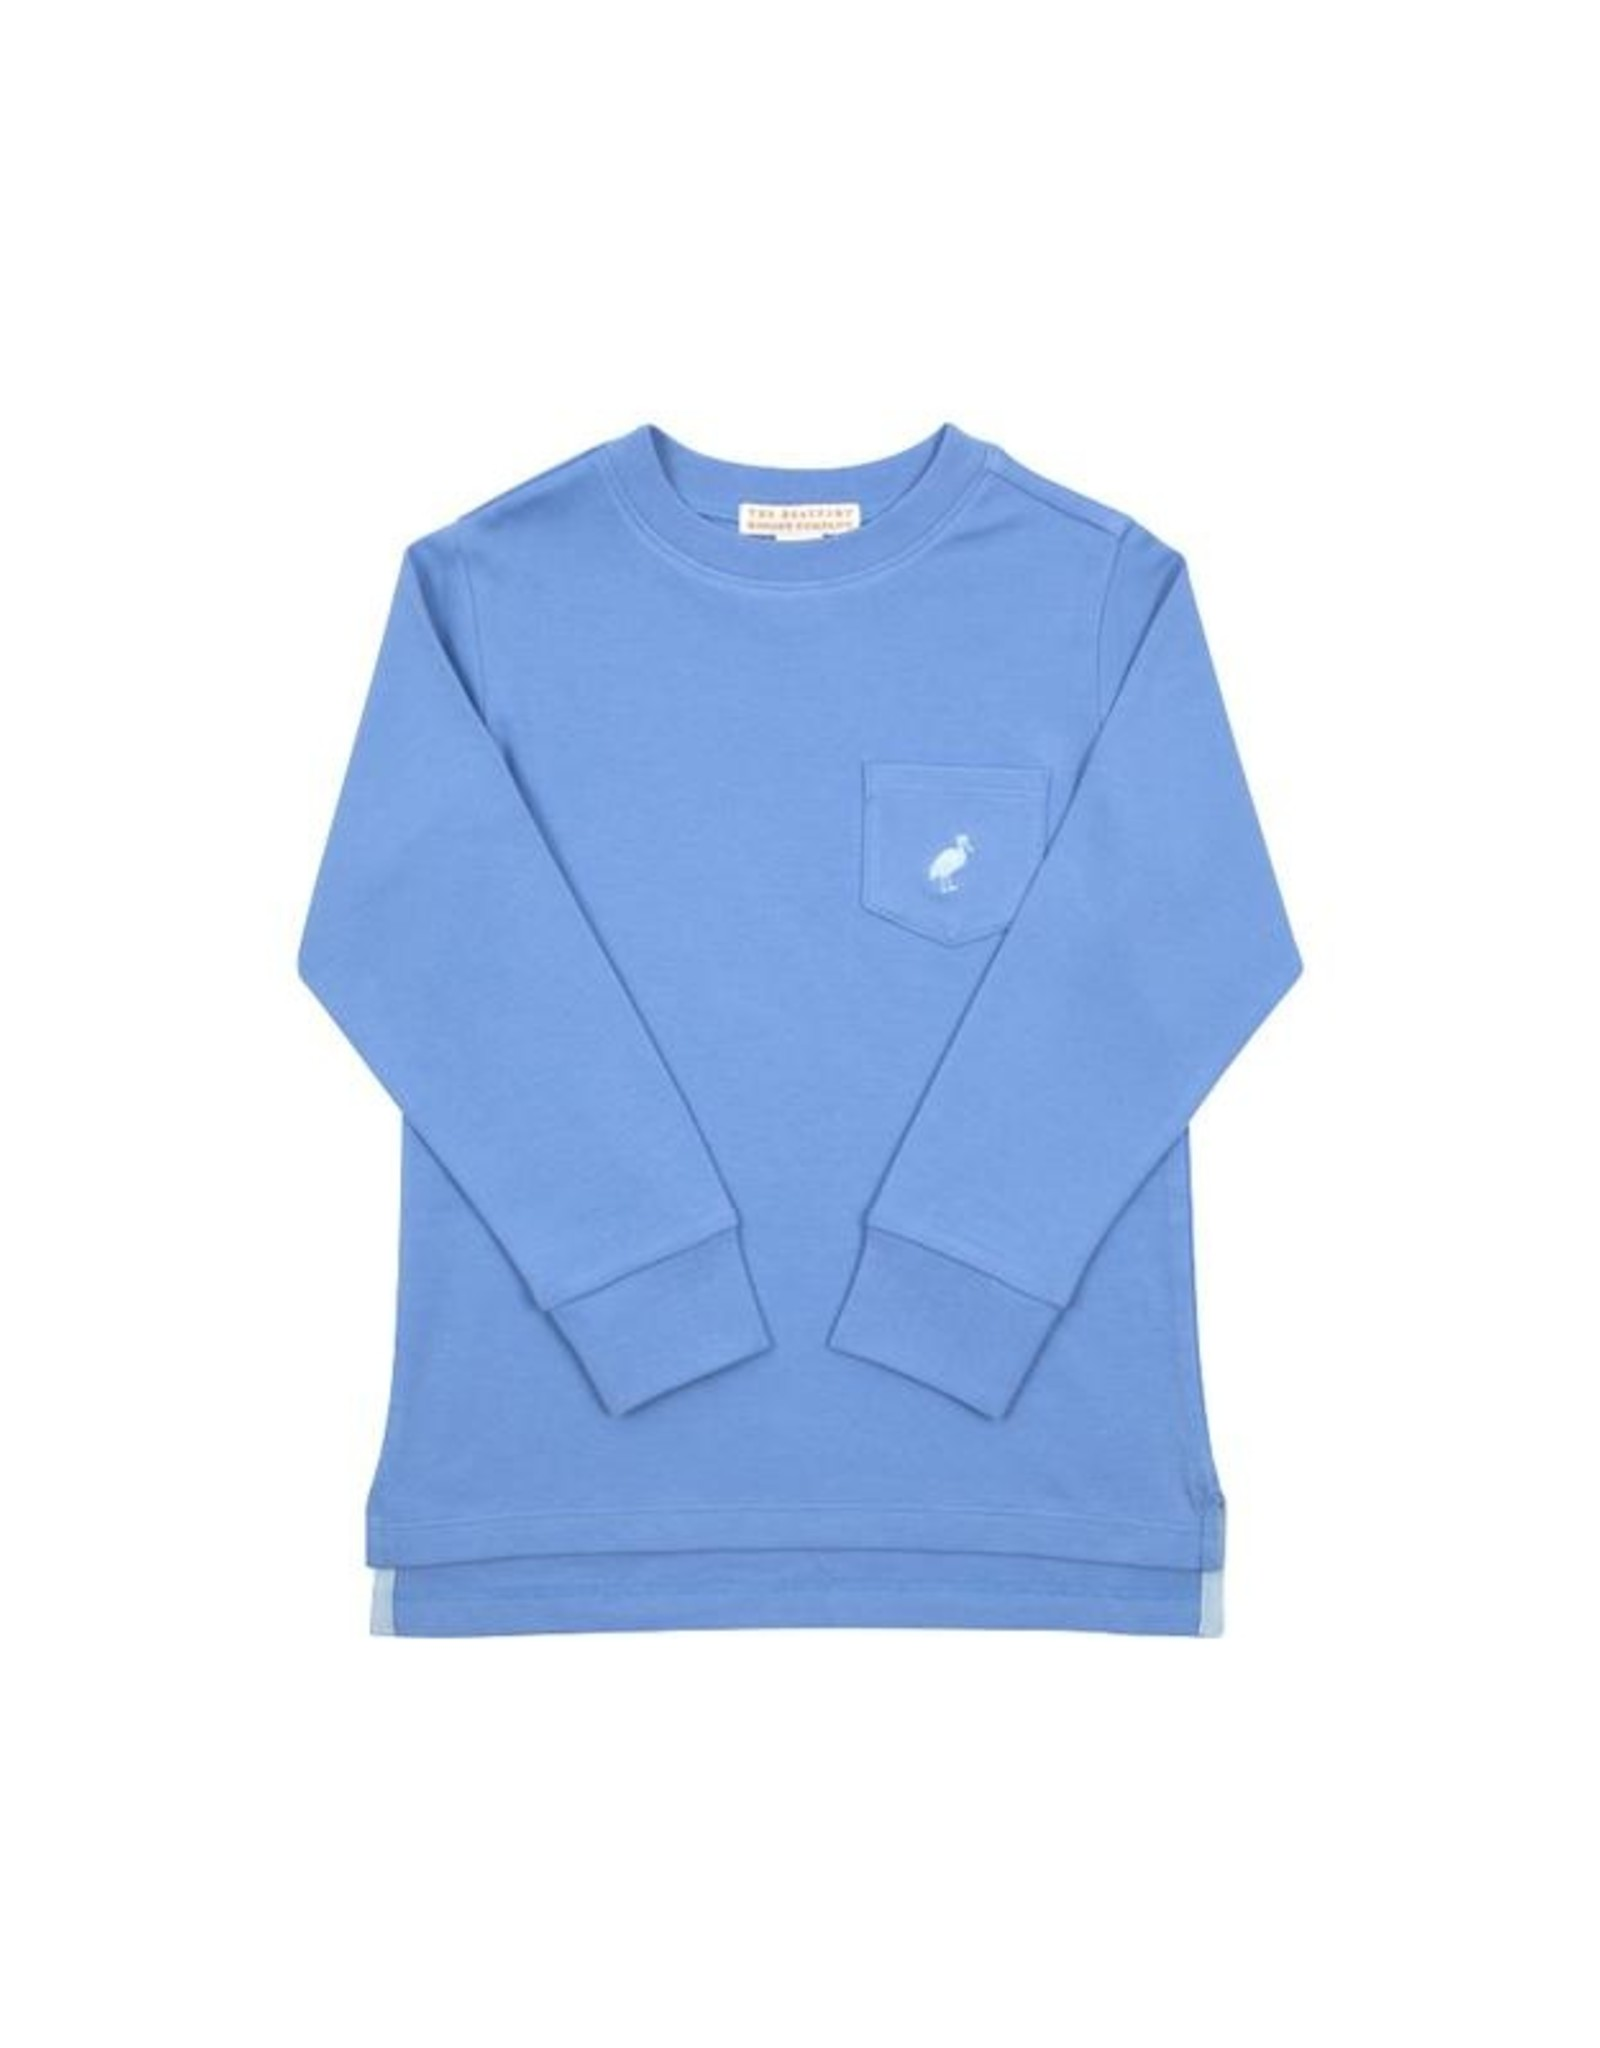 The Beaufort Bonnet Company LS Carter Crewneck With Pocket Barbados Blue